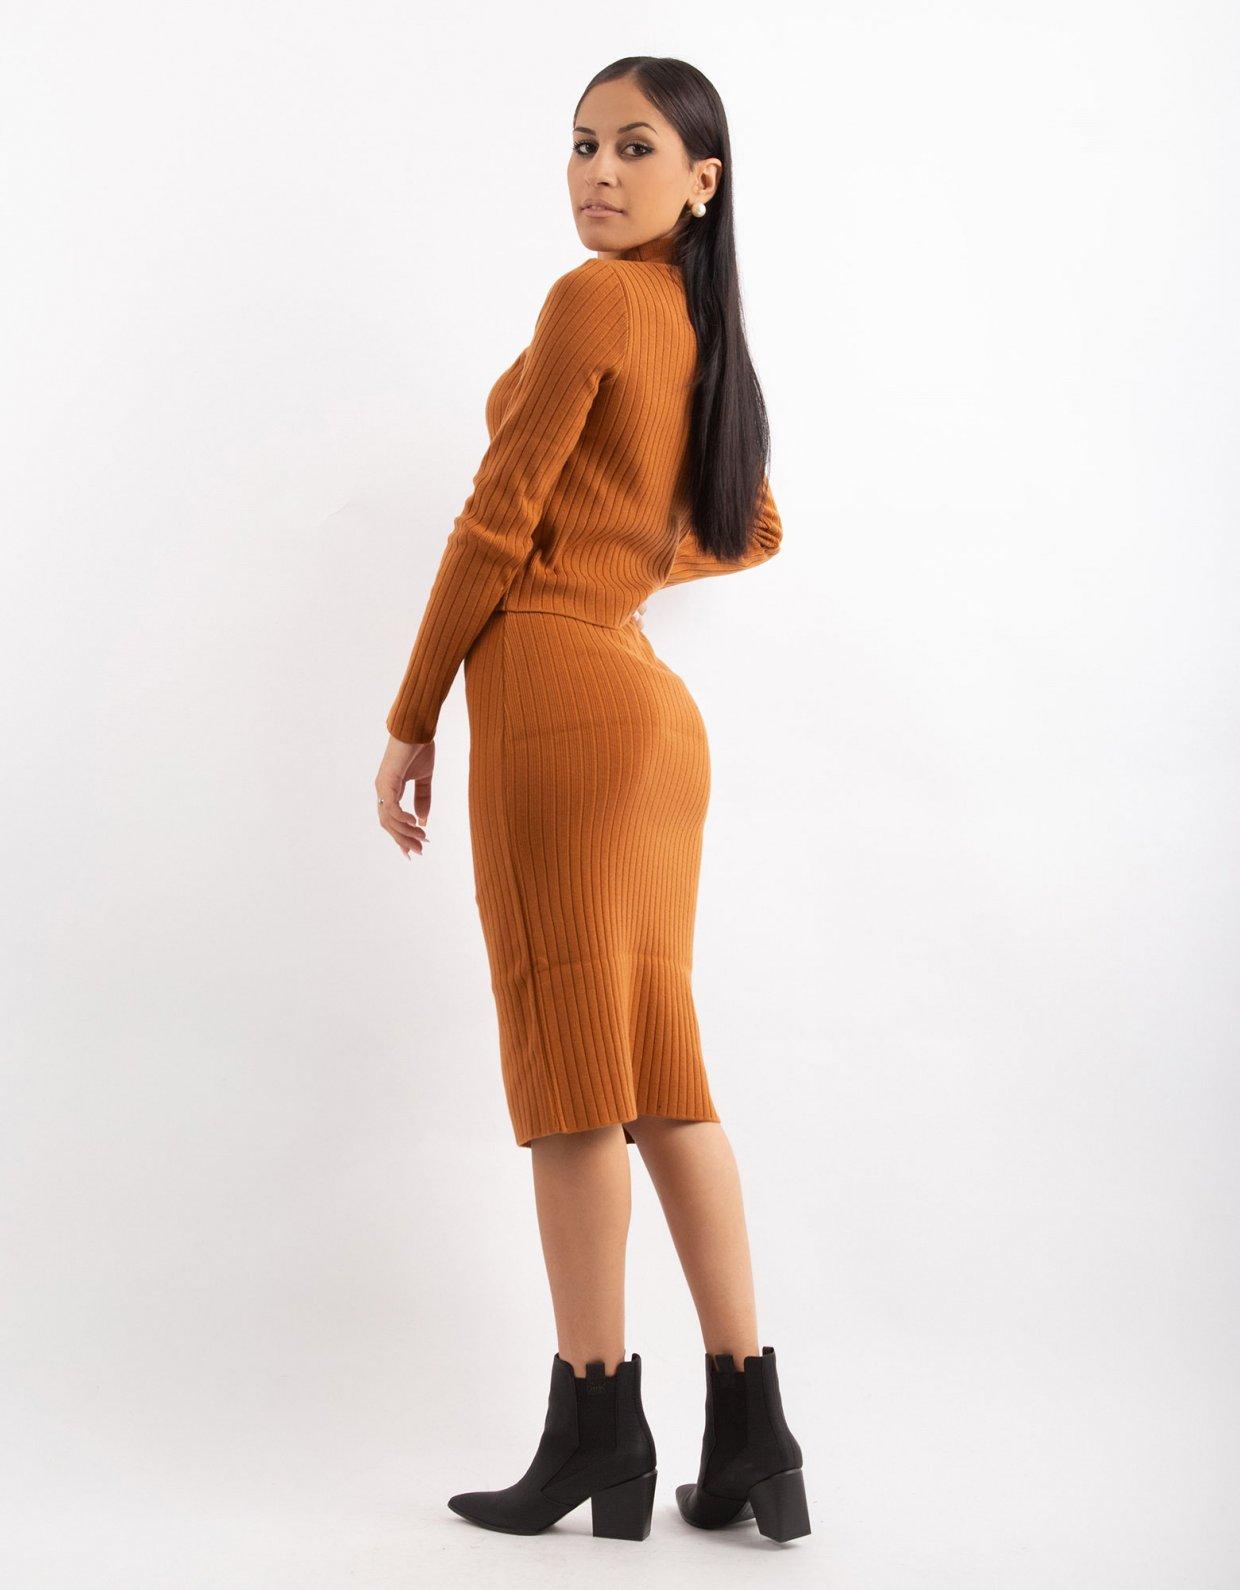 Combos Knitwear Combos W16 – Cinnamon rib midi skirt